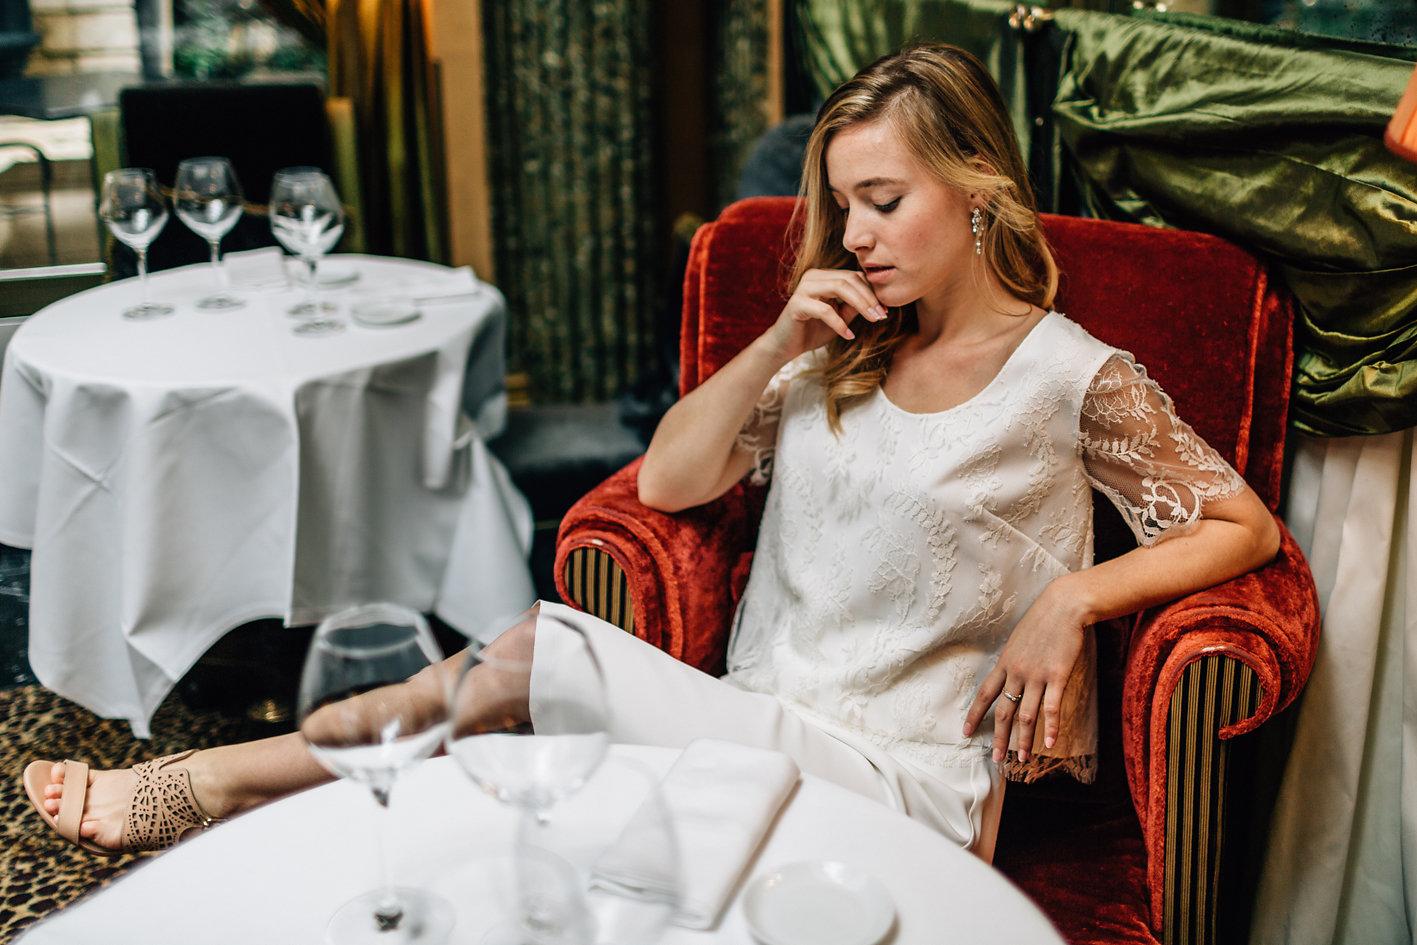 pierreatelier-photographe-paris-robe-mariage-organse-160.jpg